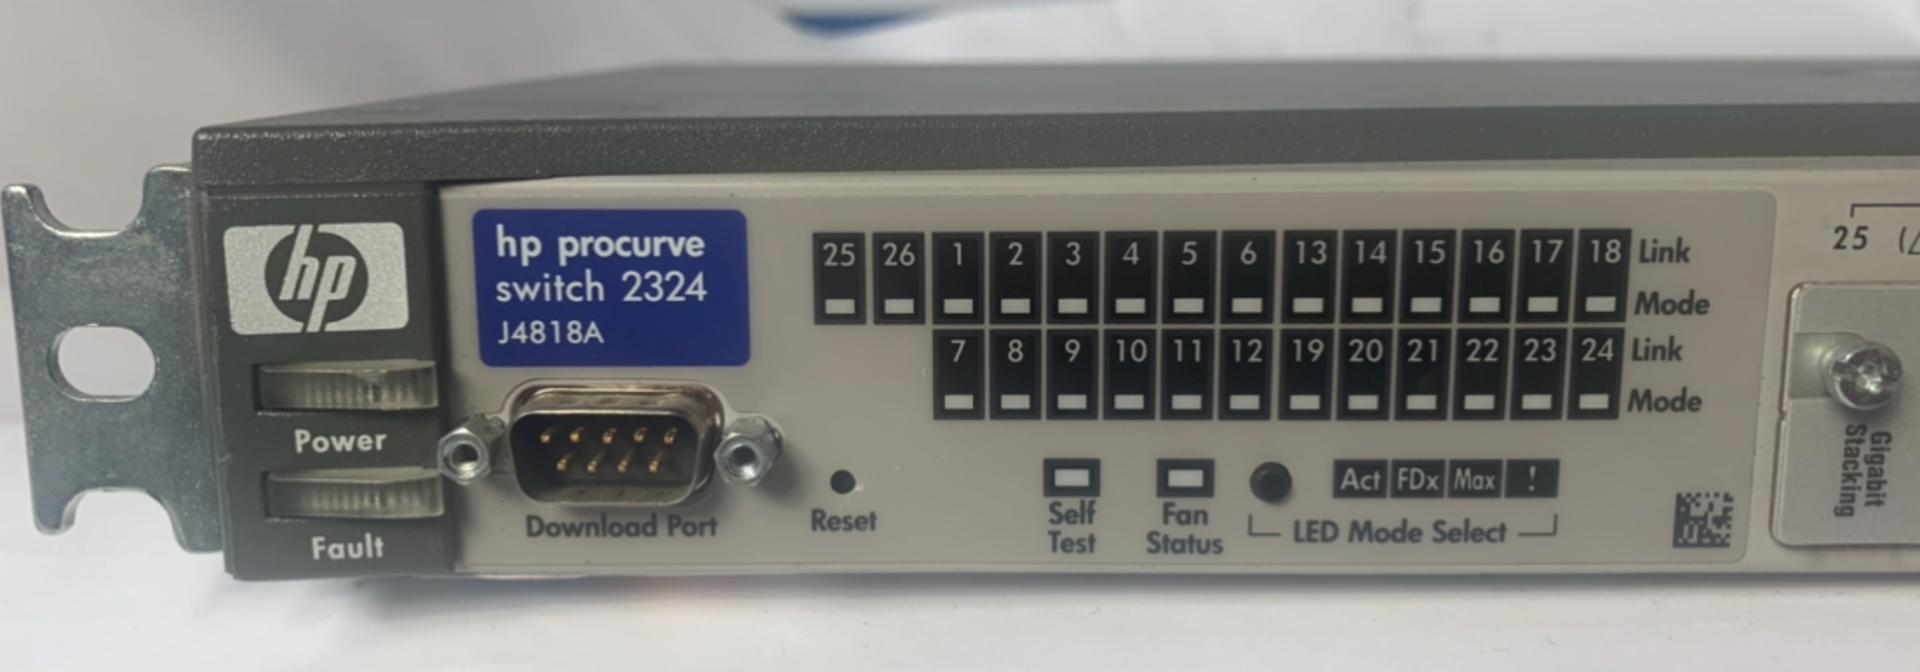 Lot 48 - HP J4818A Pro 24 Port Switch